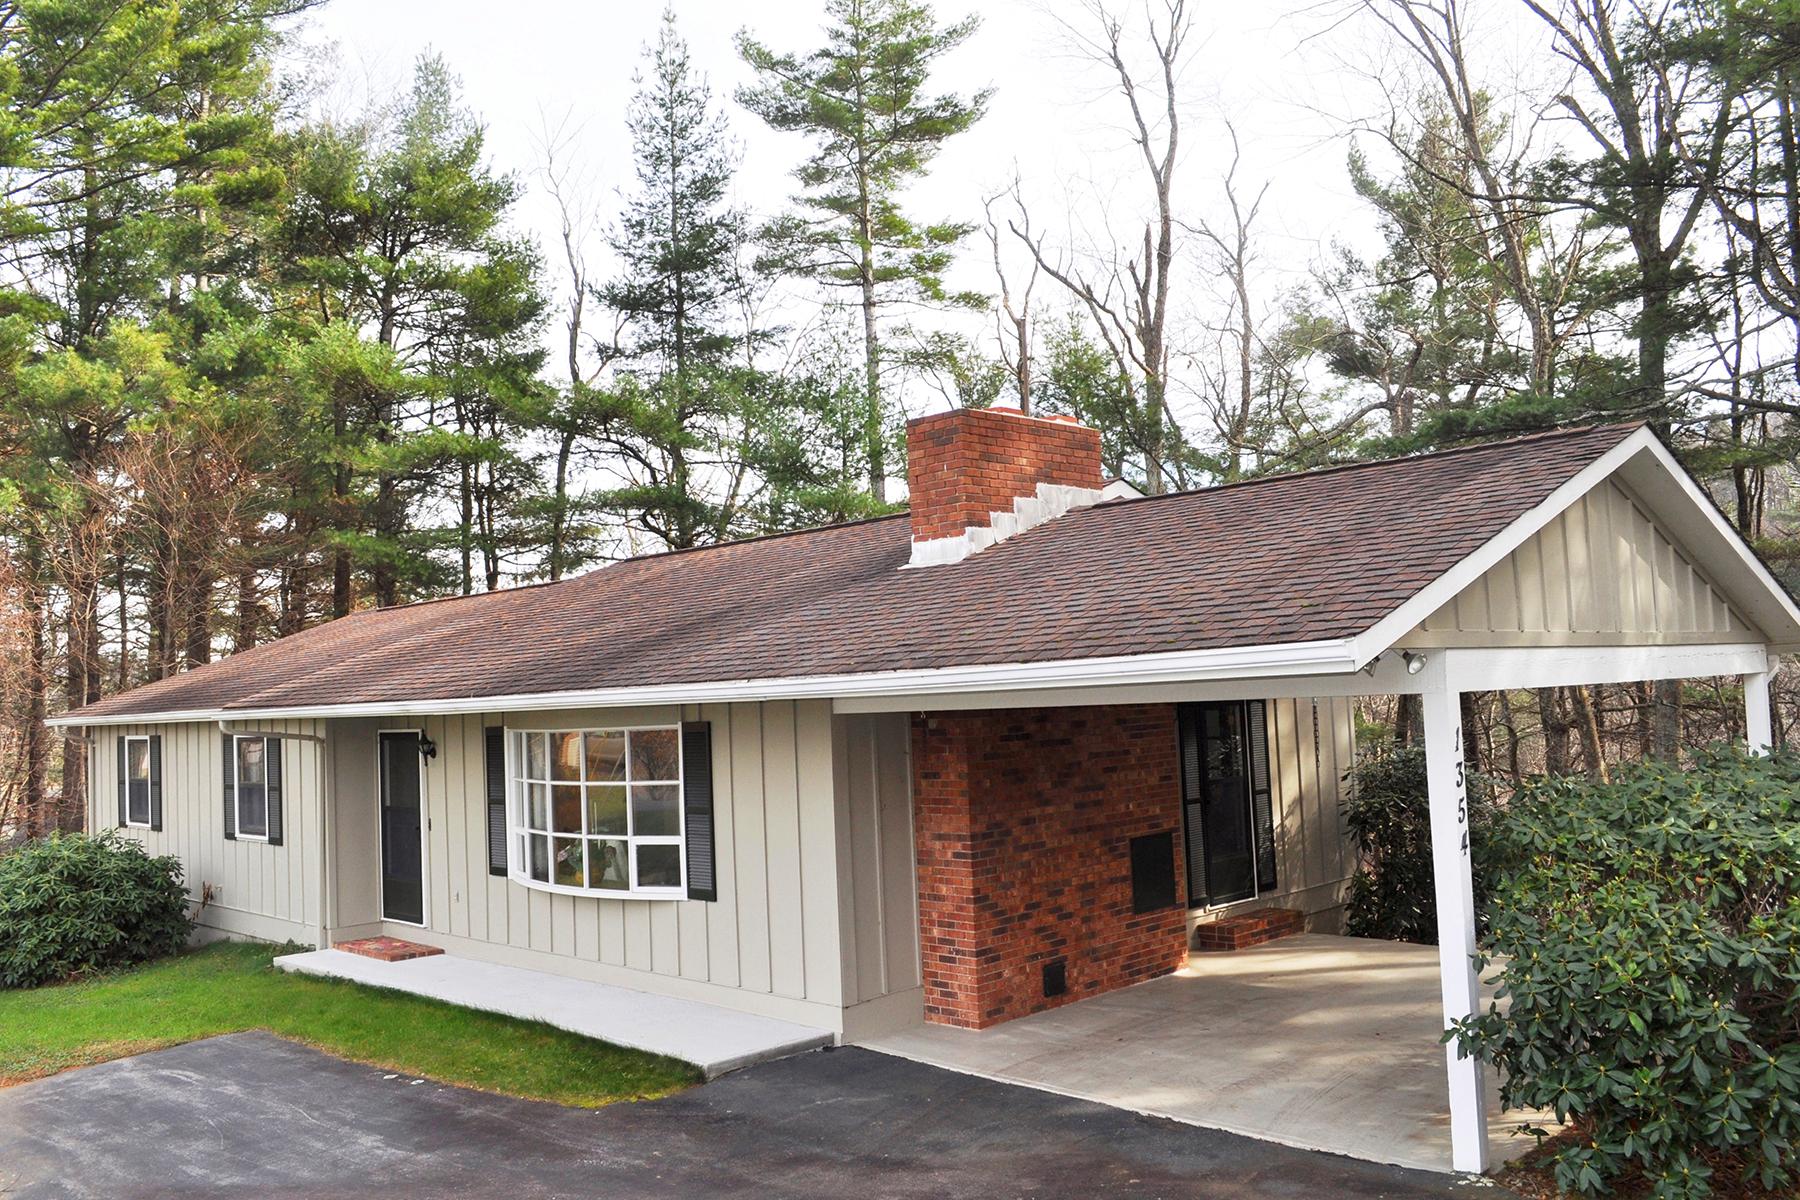 Single Family Home for Sale at BOONE 1354 Ravens Ridge Cir, Boone, North Carolina 28607 United States